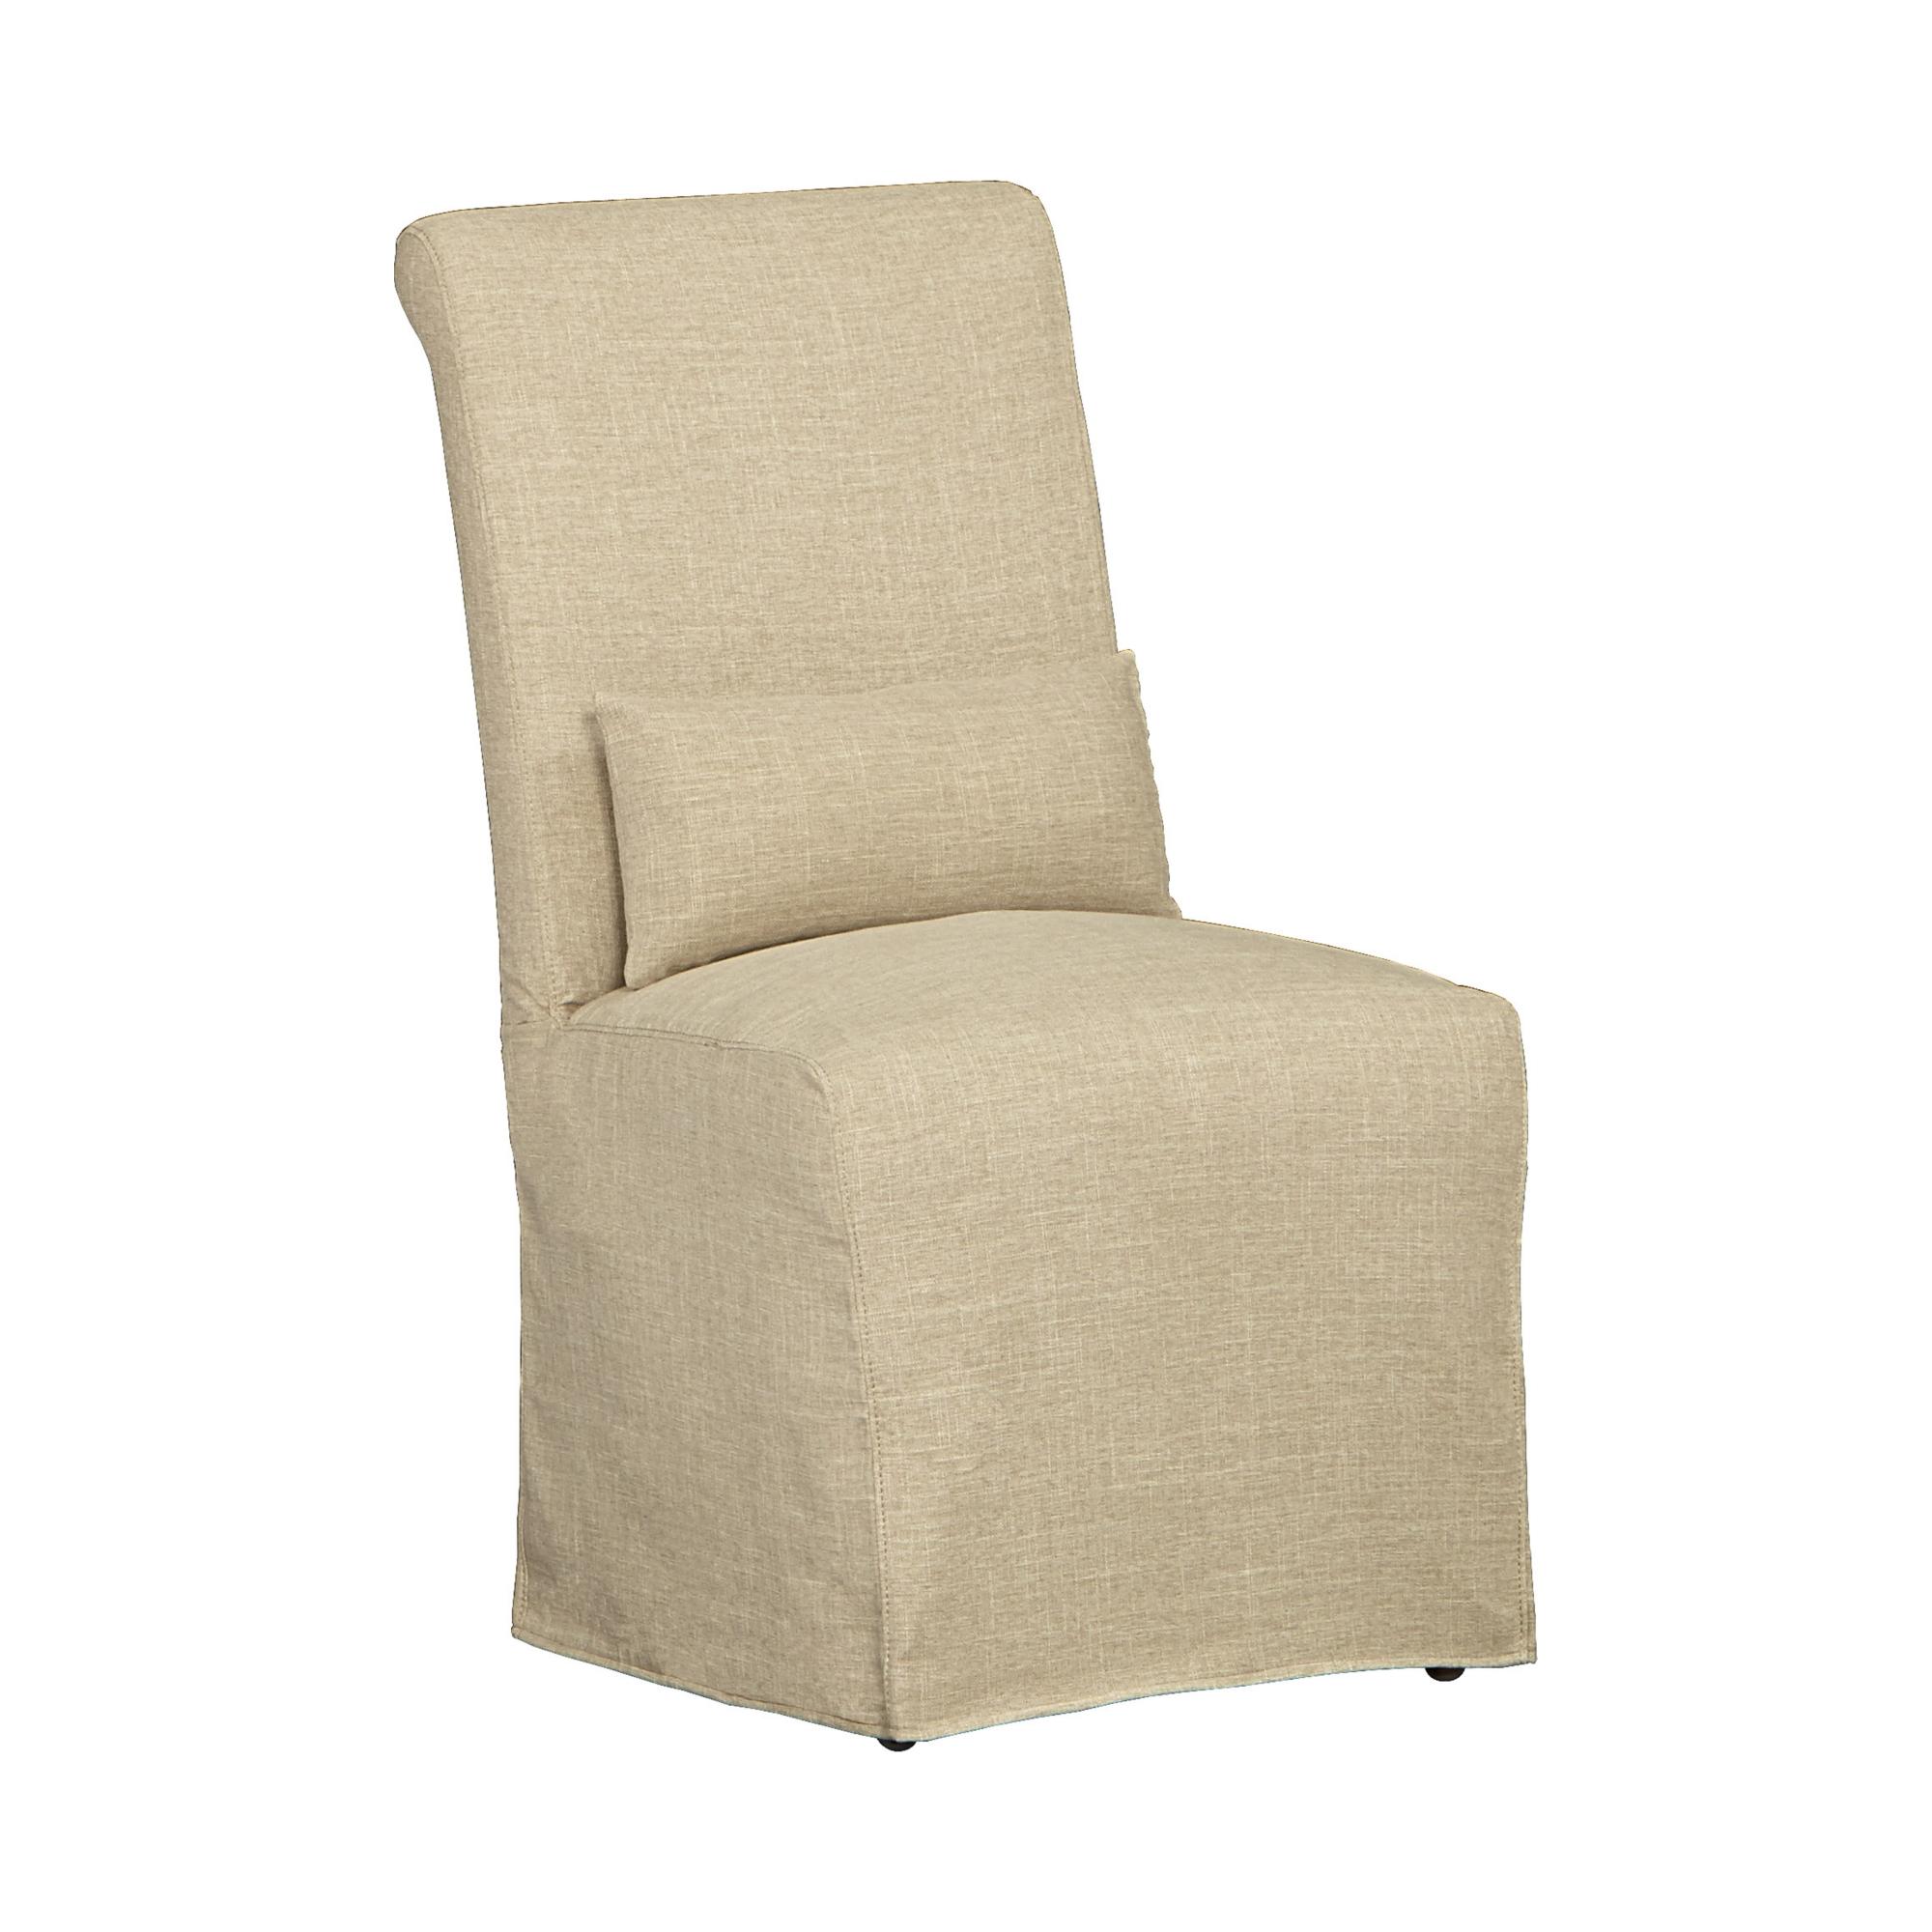 Parsons Chairs   Havertys. Parsons Arm Chair. Home Design Ideas